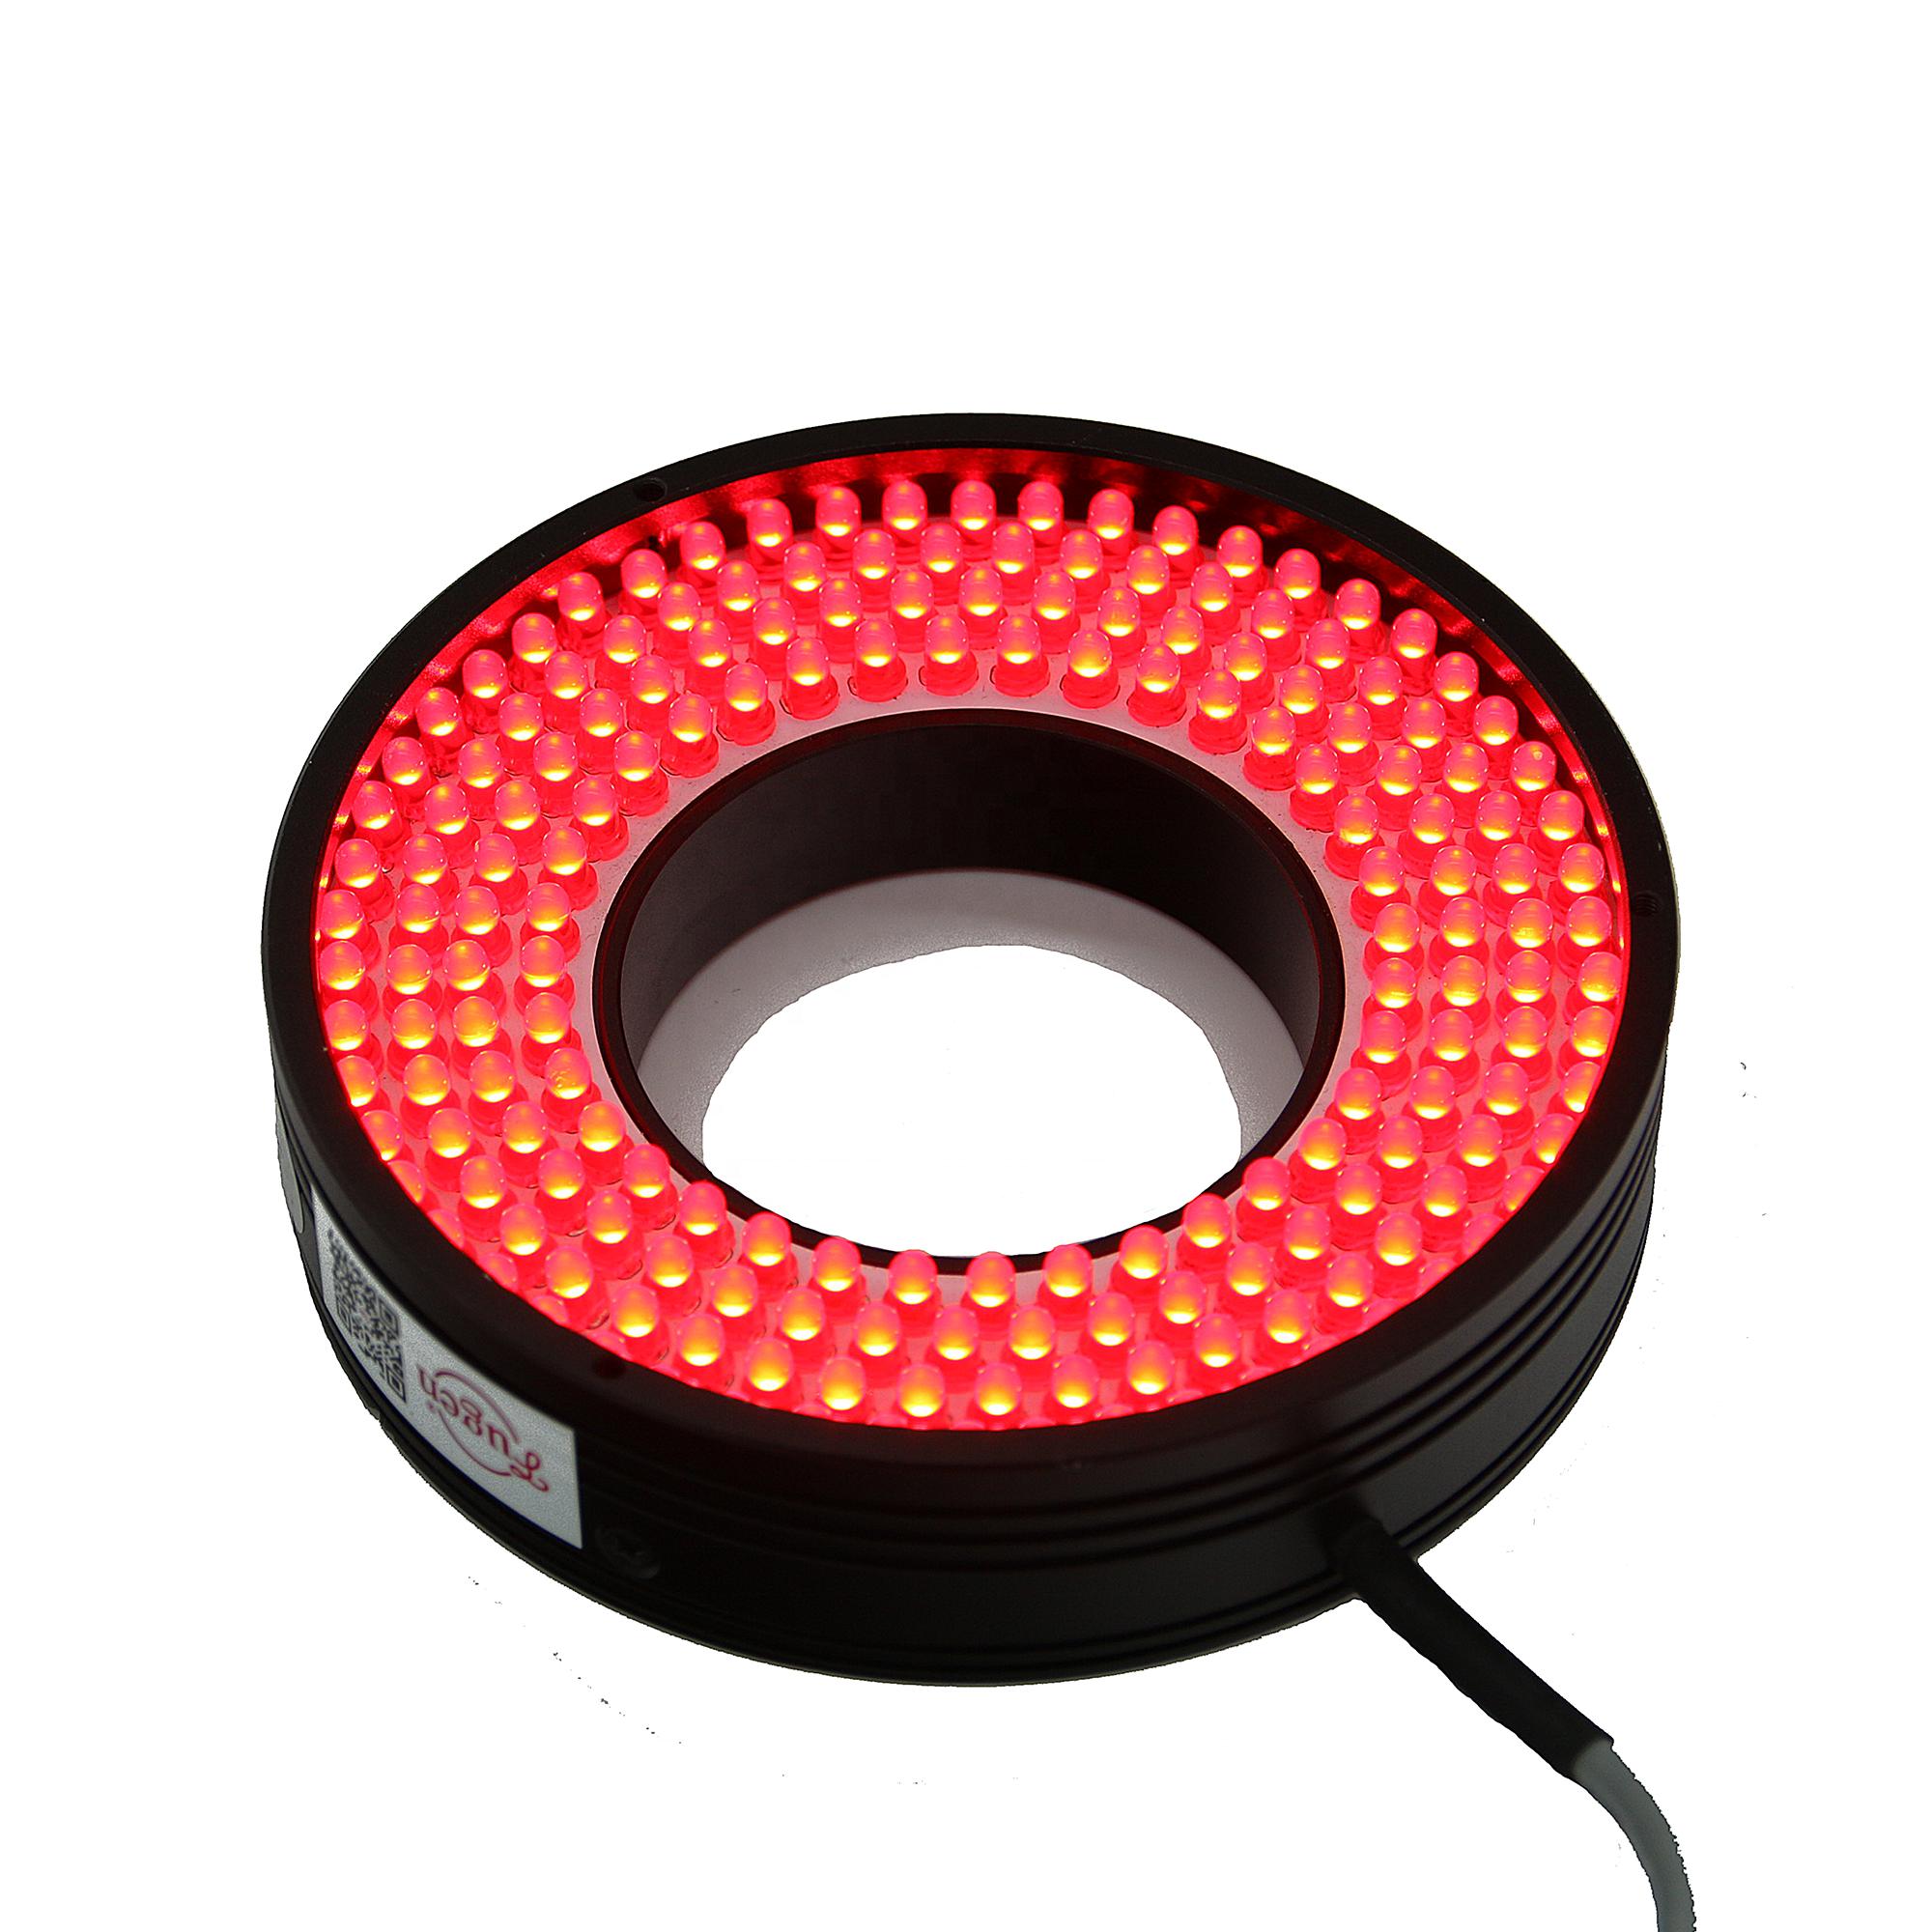 Parity instead of OPT lights microscope illuminator led ring light machine vision